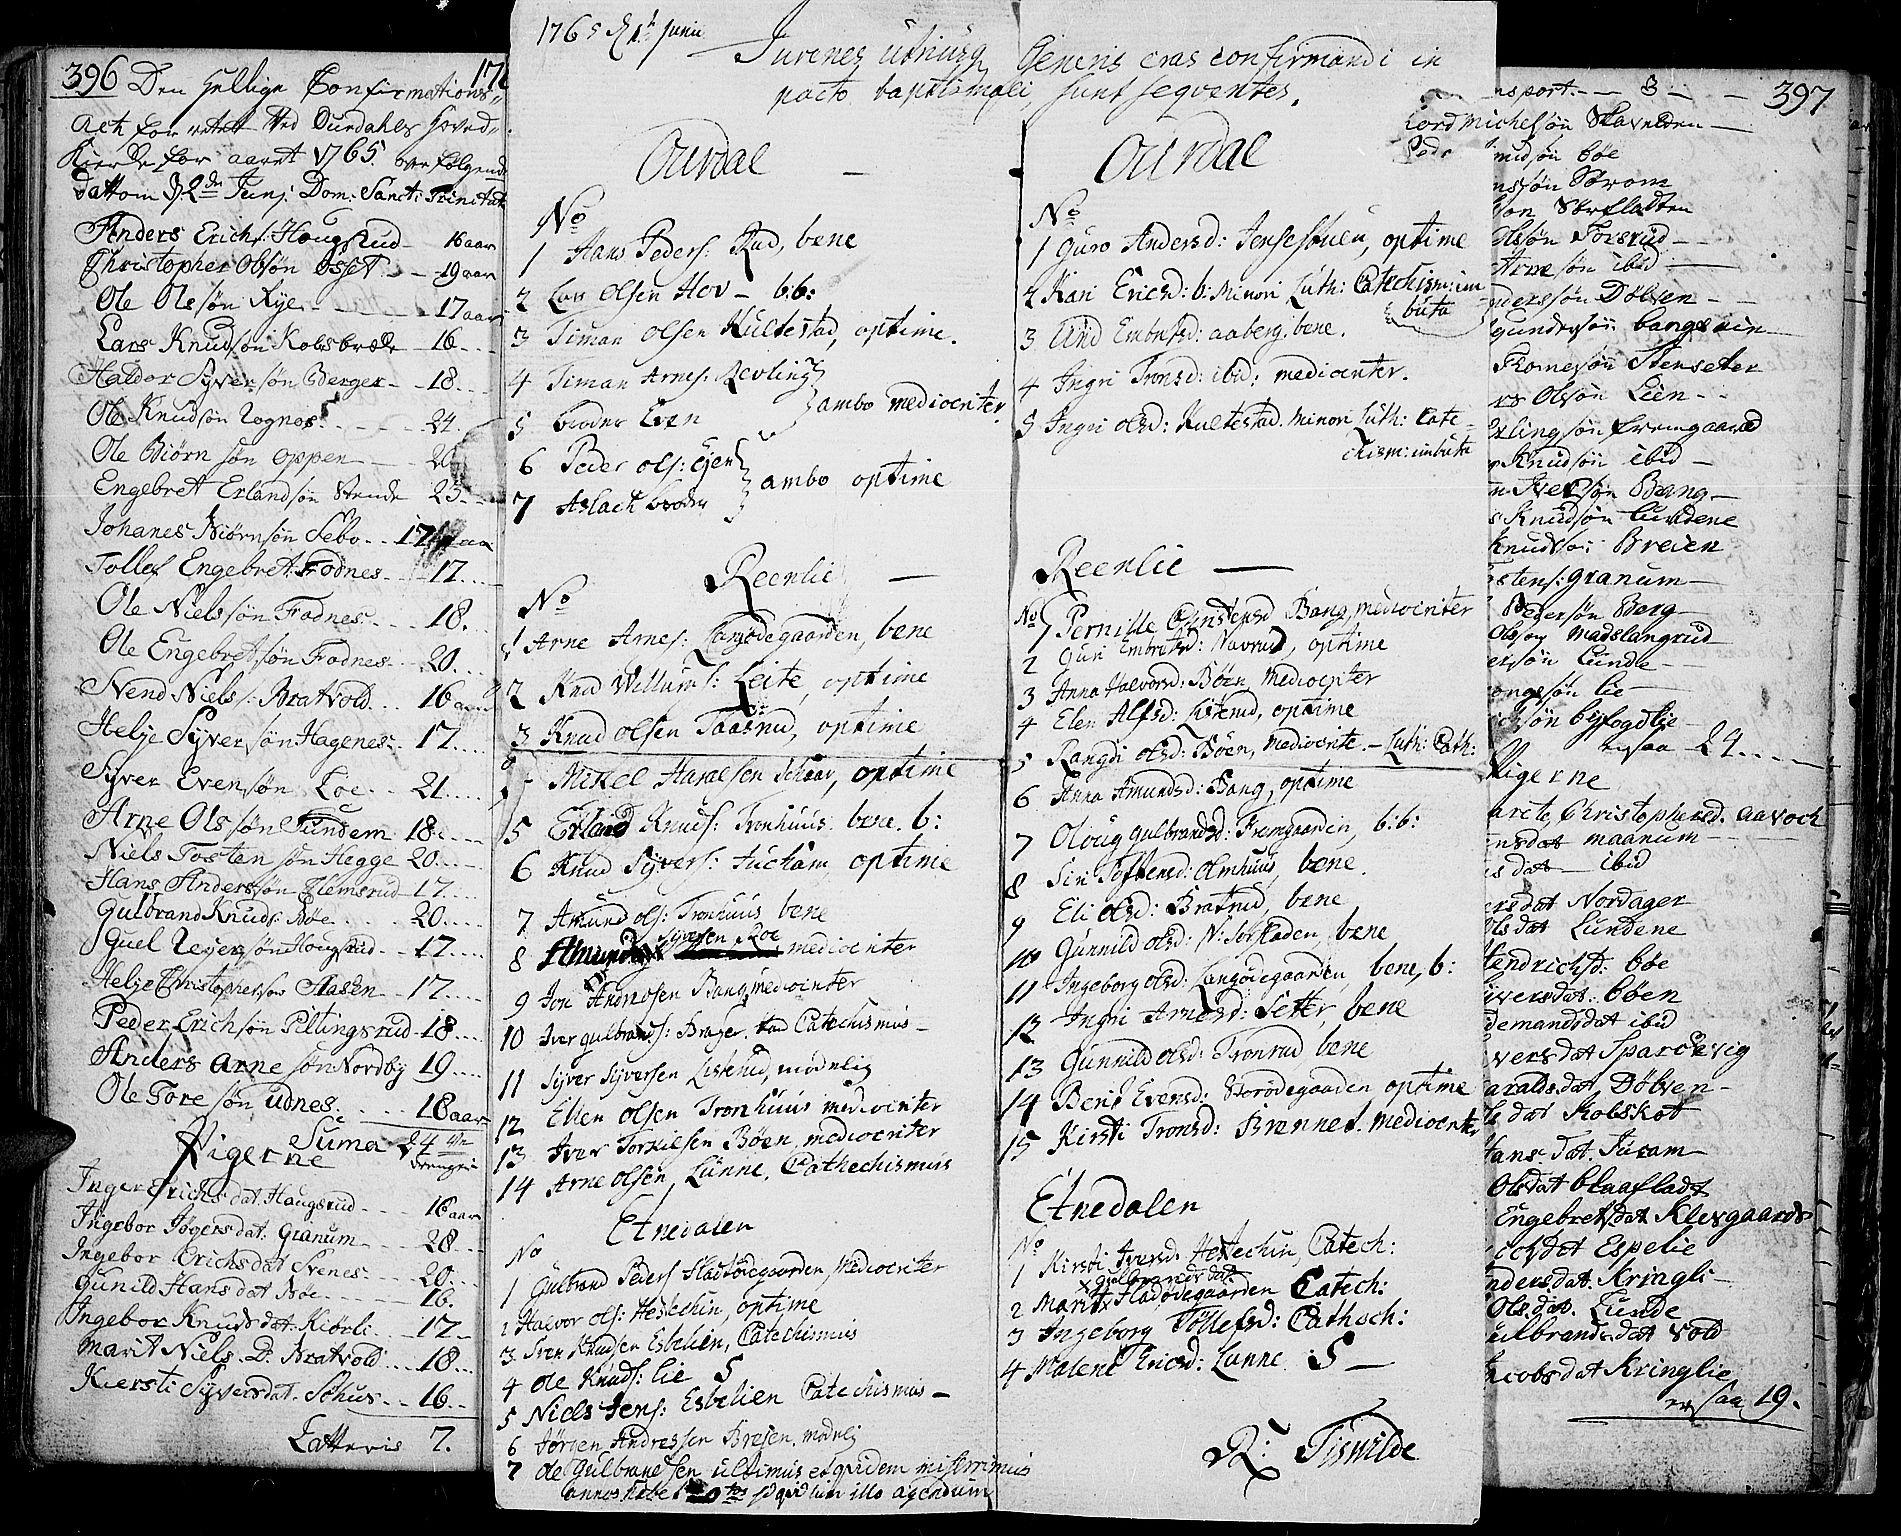 SAH, Aurdal prestekontor, Ministerialbok nr. 5, 1763-1781, s. 396-397